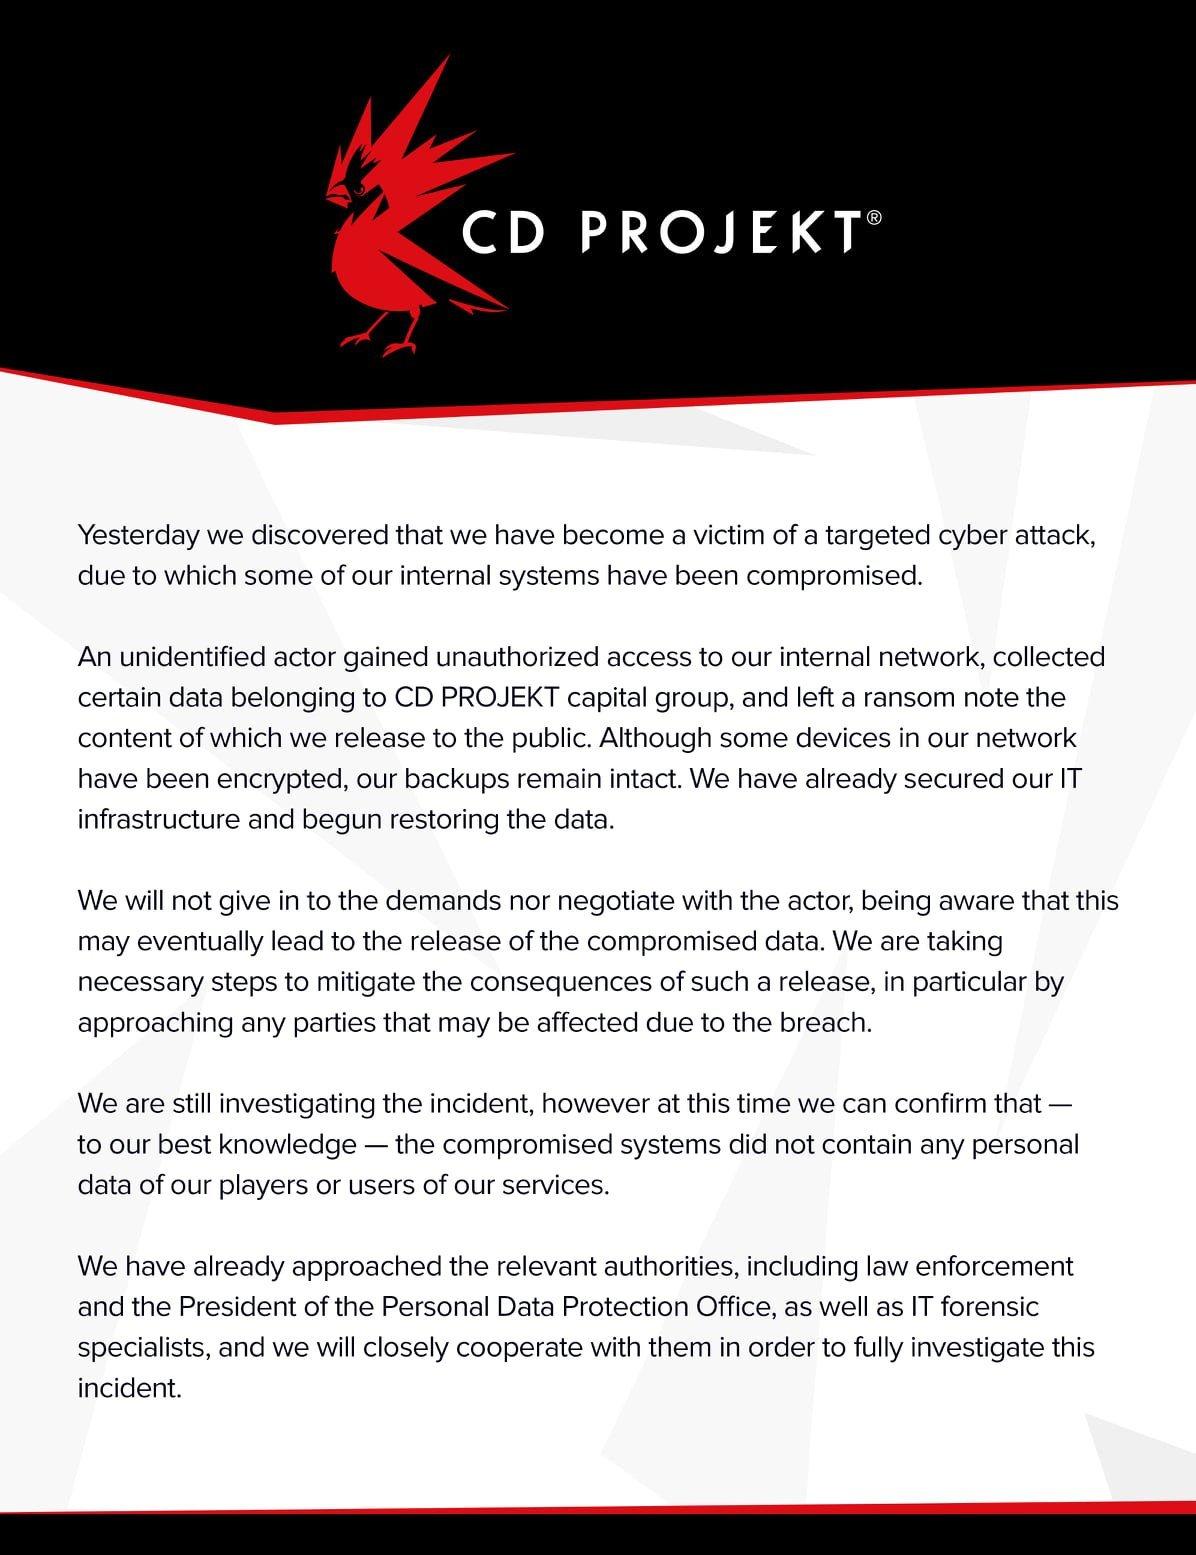 CDPR 2021 Cyber Attack Statement